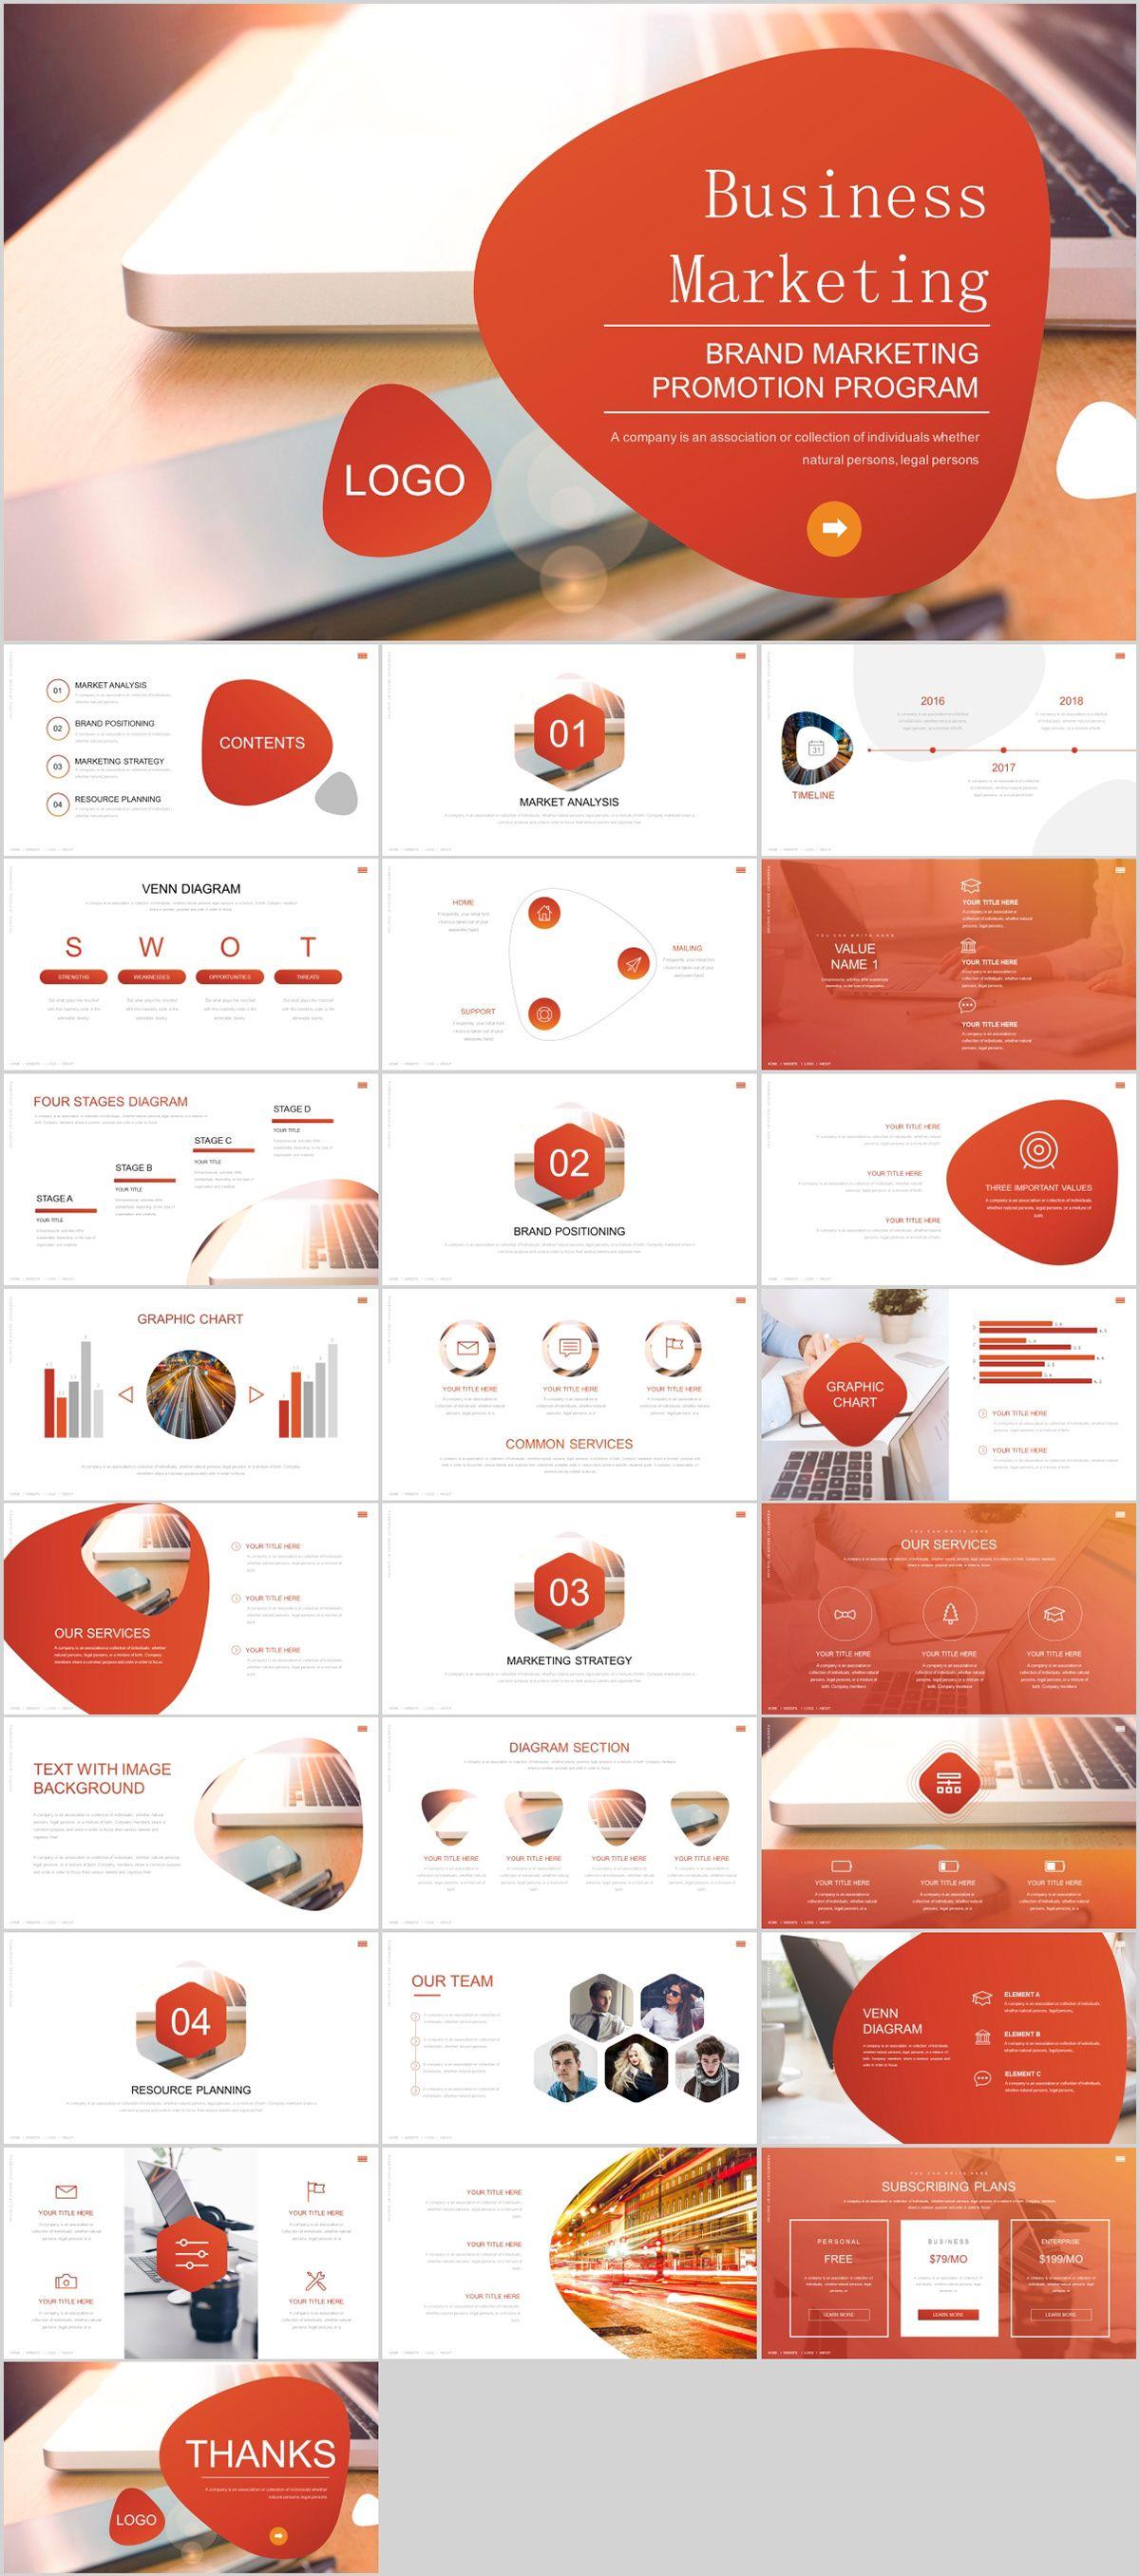 26 business marketing analysis powerpoint template on behance 26 business marketing analysis powerpoint template on behance powerpoint templates presentation toneelgroepblik Choice Image